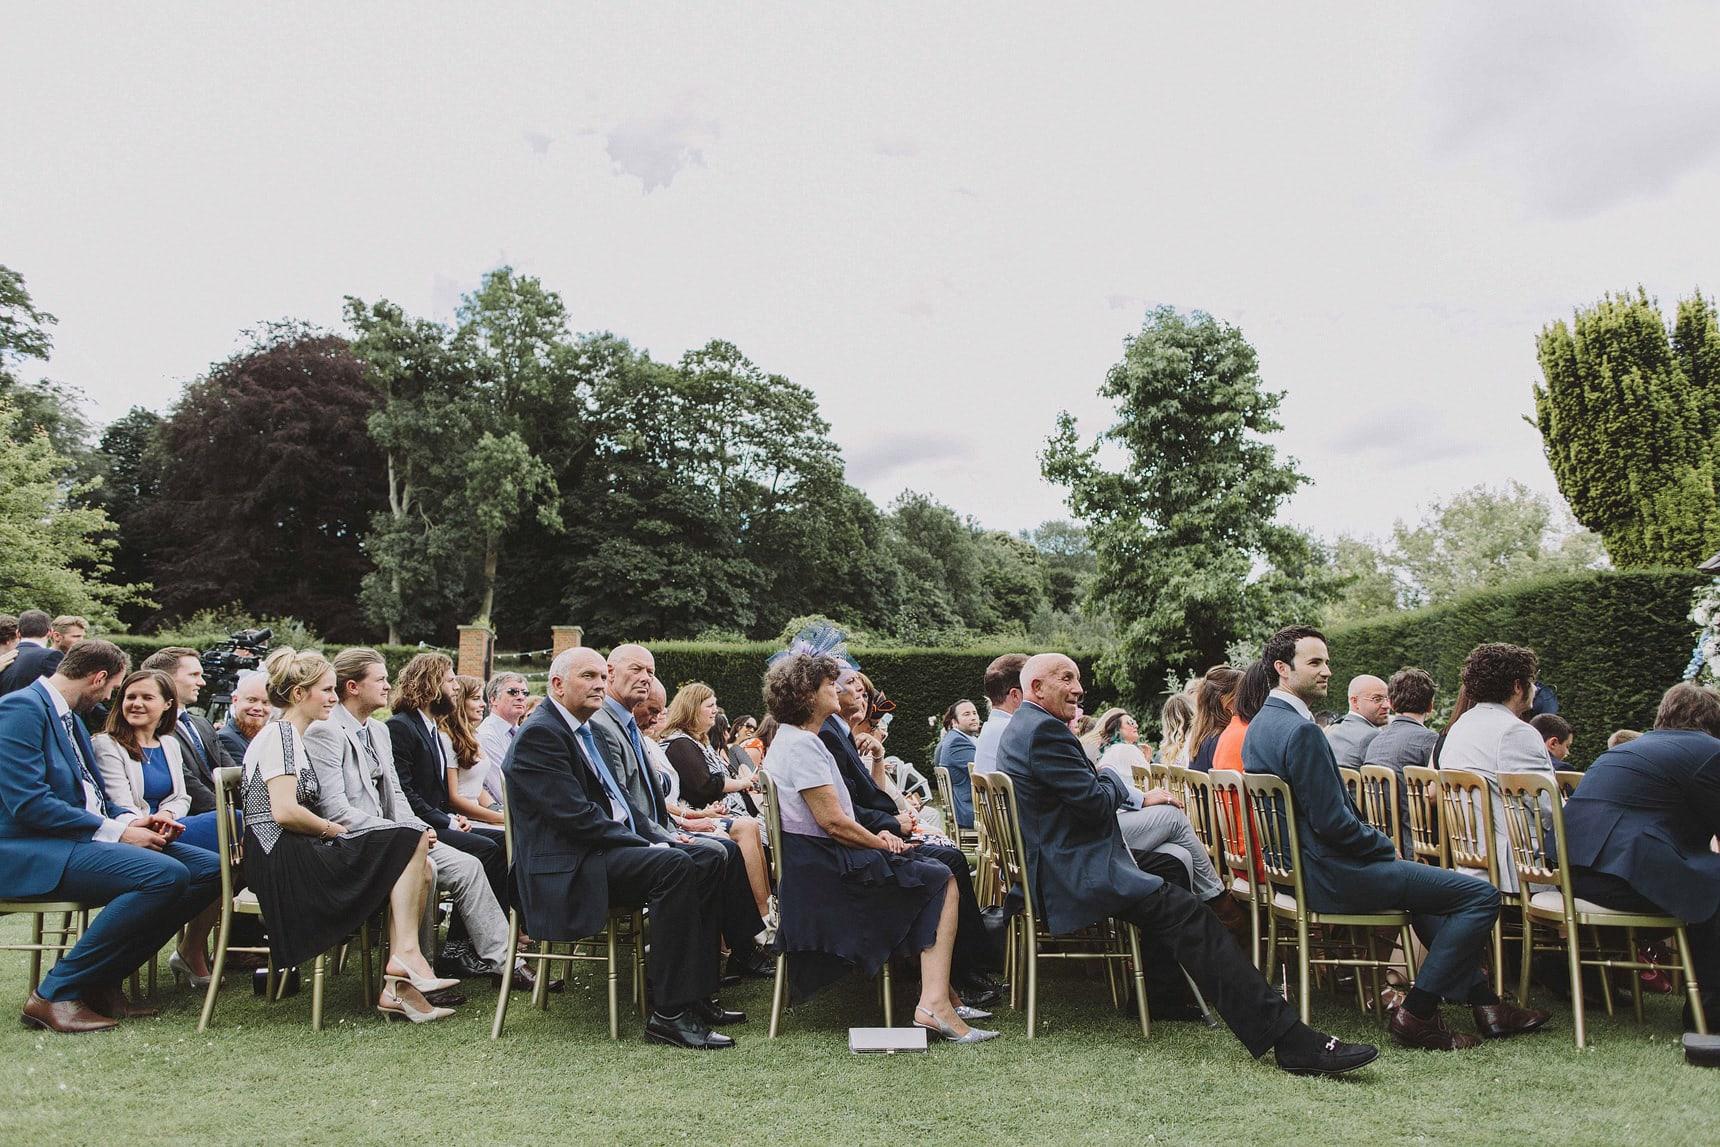 swarling manor petham wedding photographer